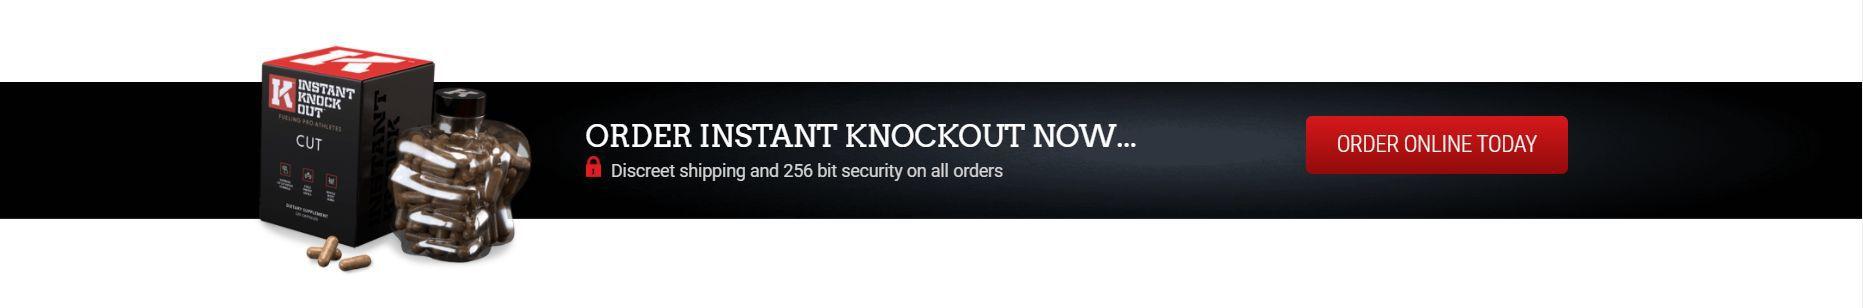 Instant Knockout Packaging on Black Background